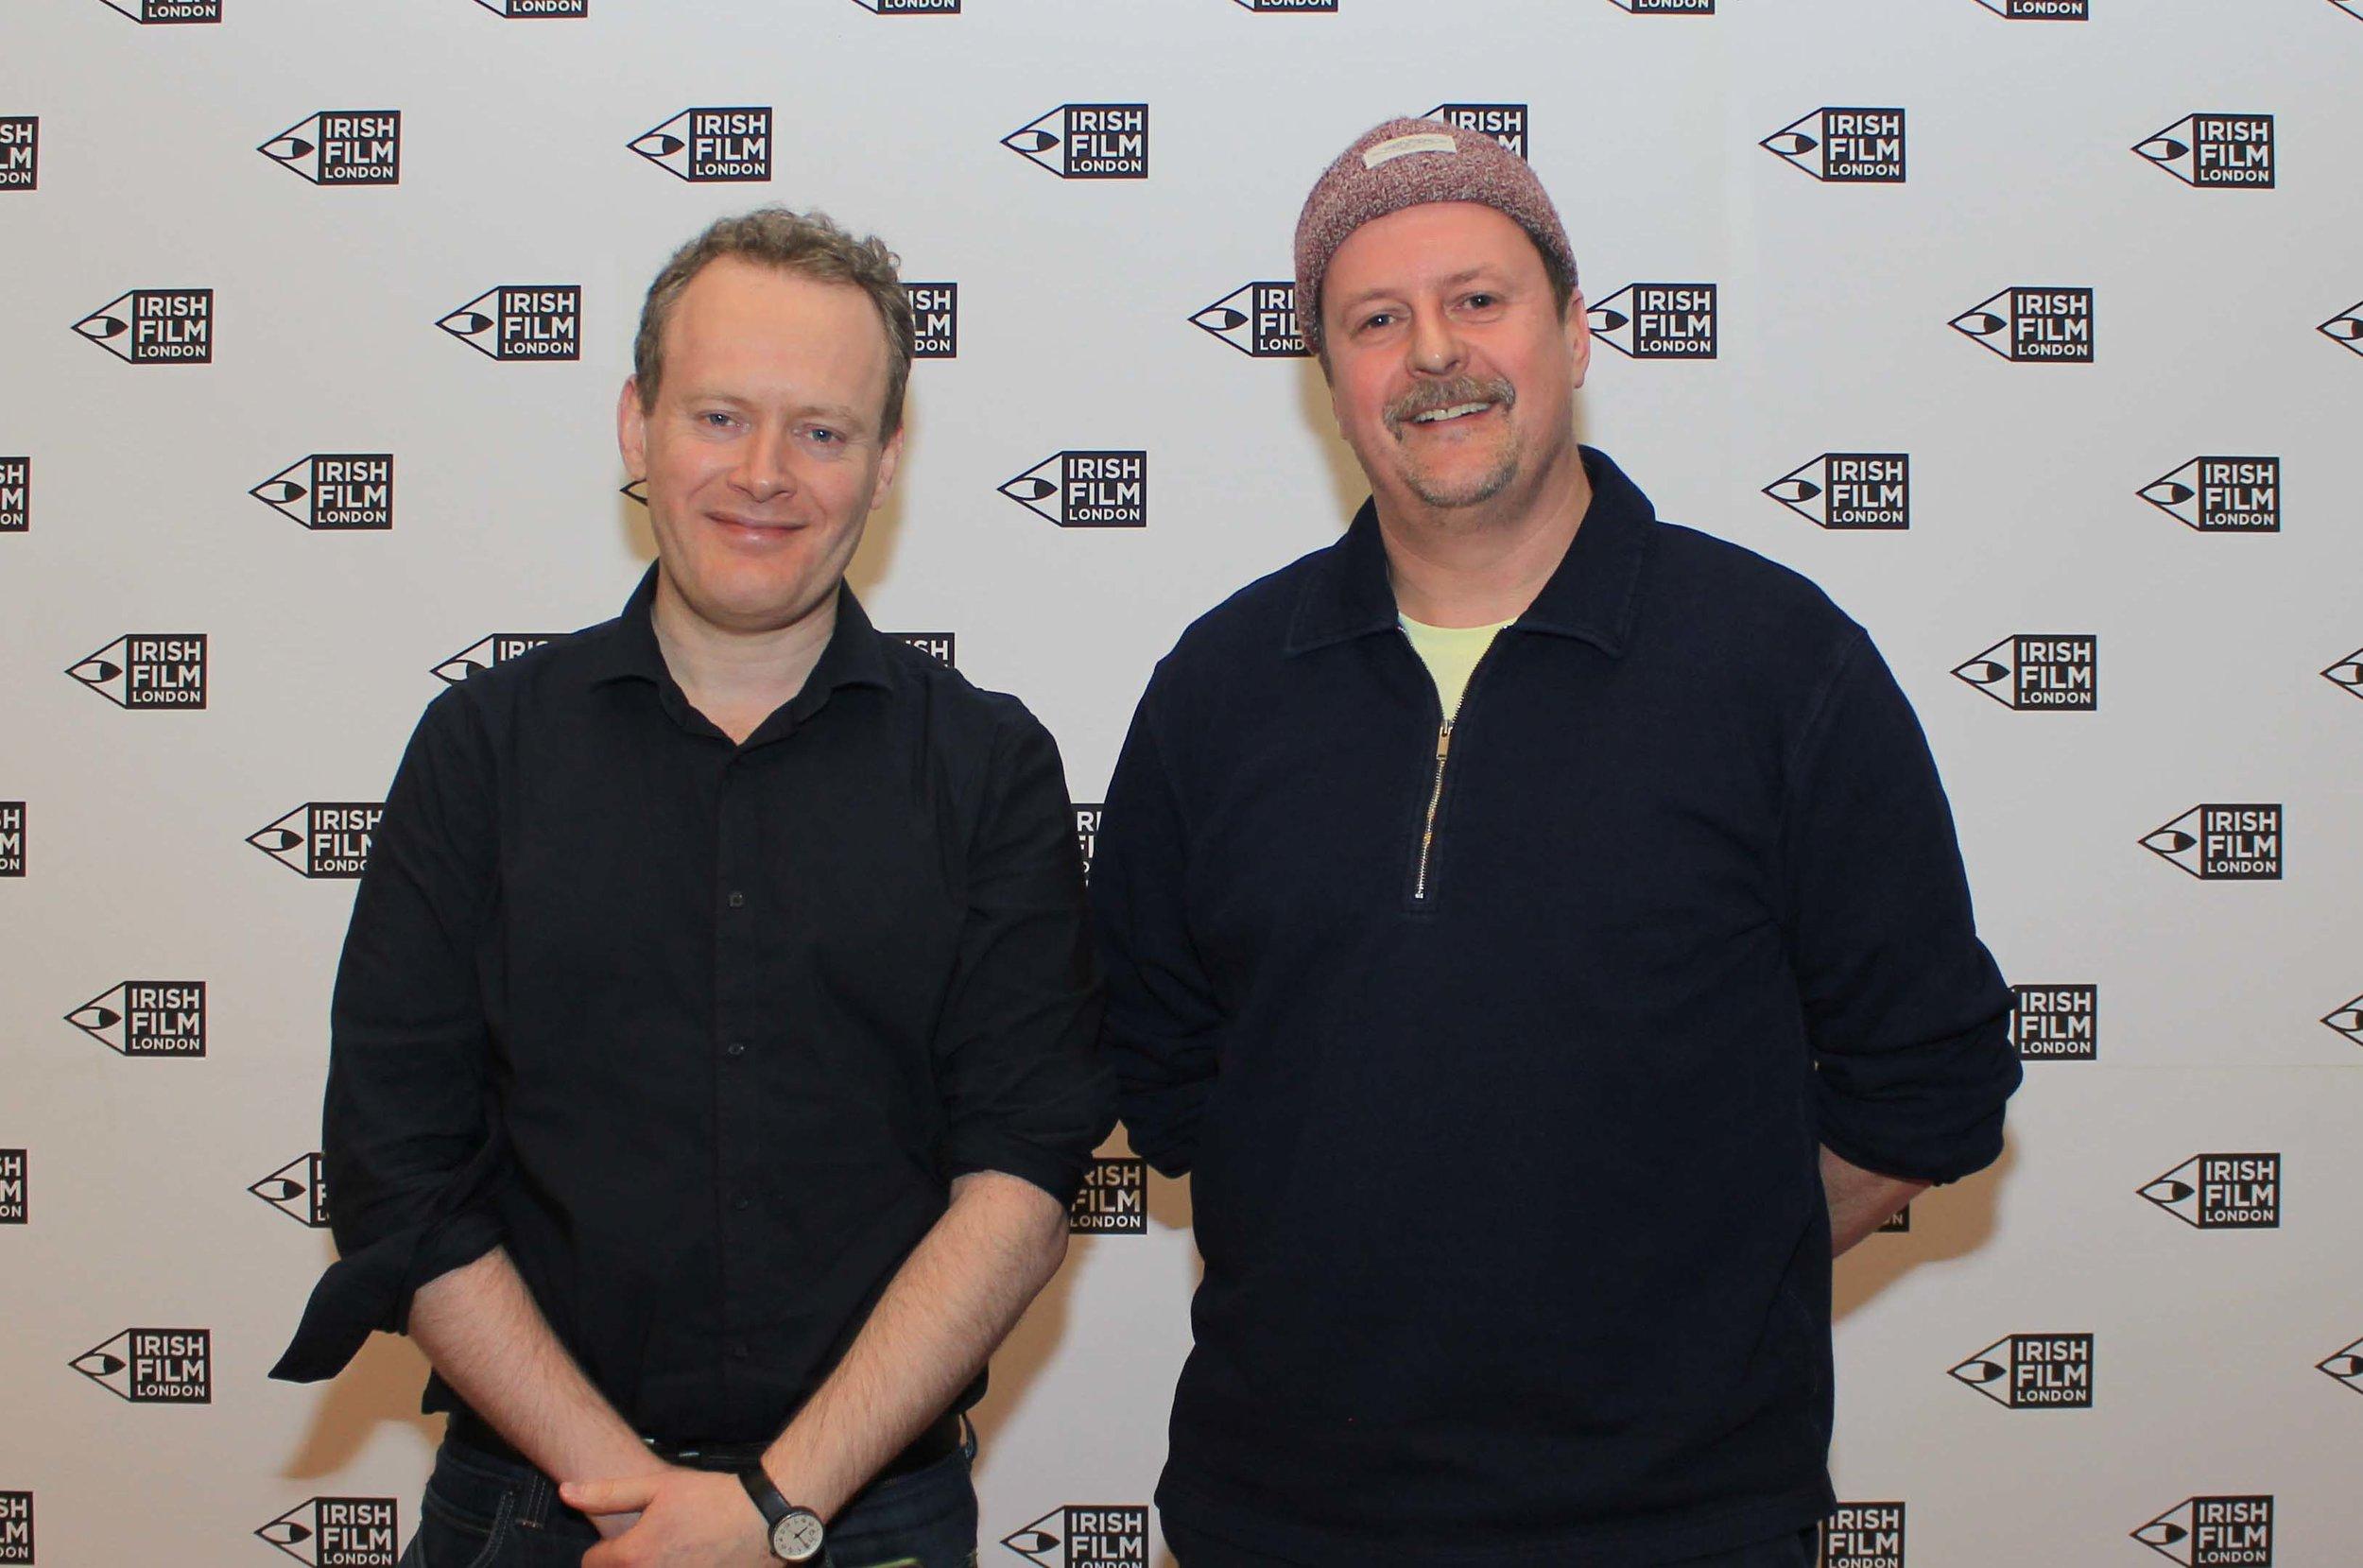 Irish Film London - Matthew Todd and John Butler